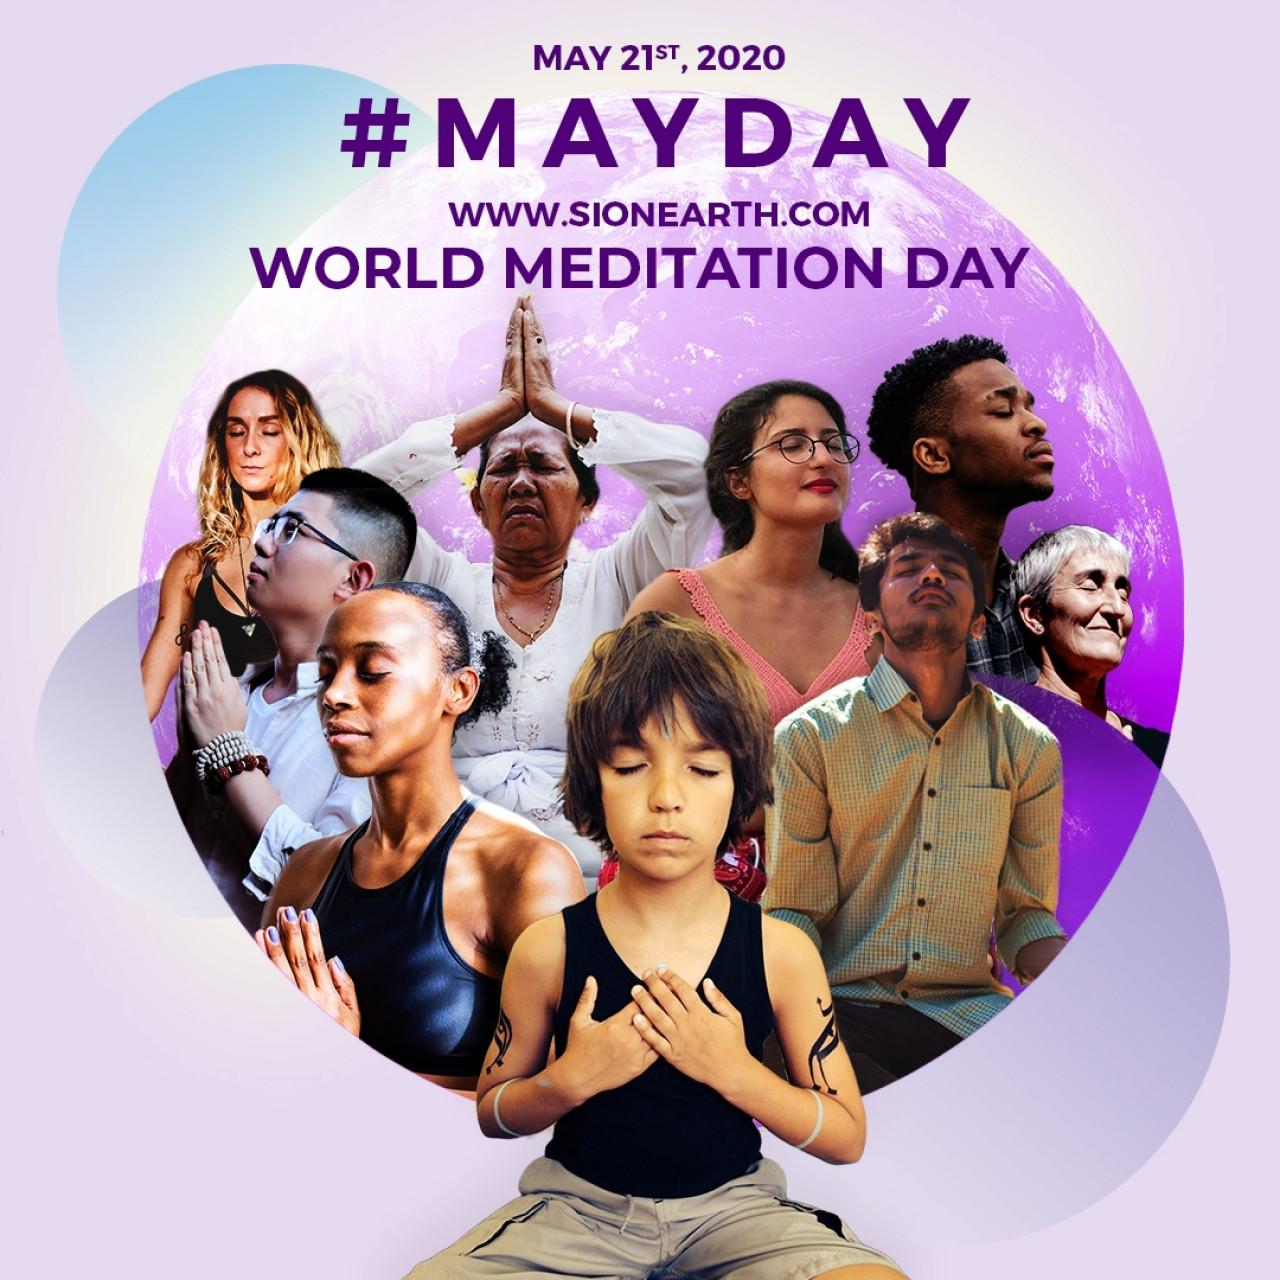 May Day Social Earth Sun People V2 1 Copy